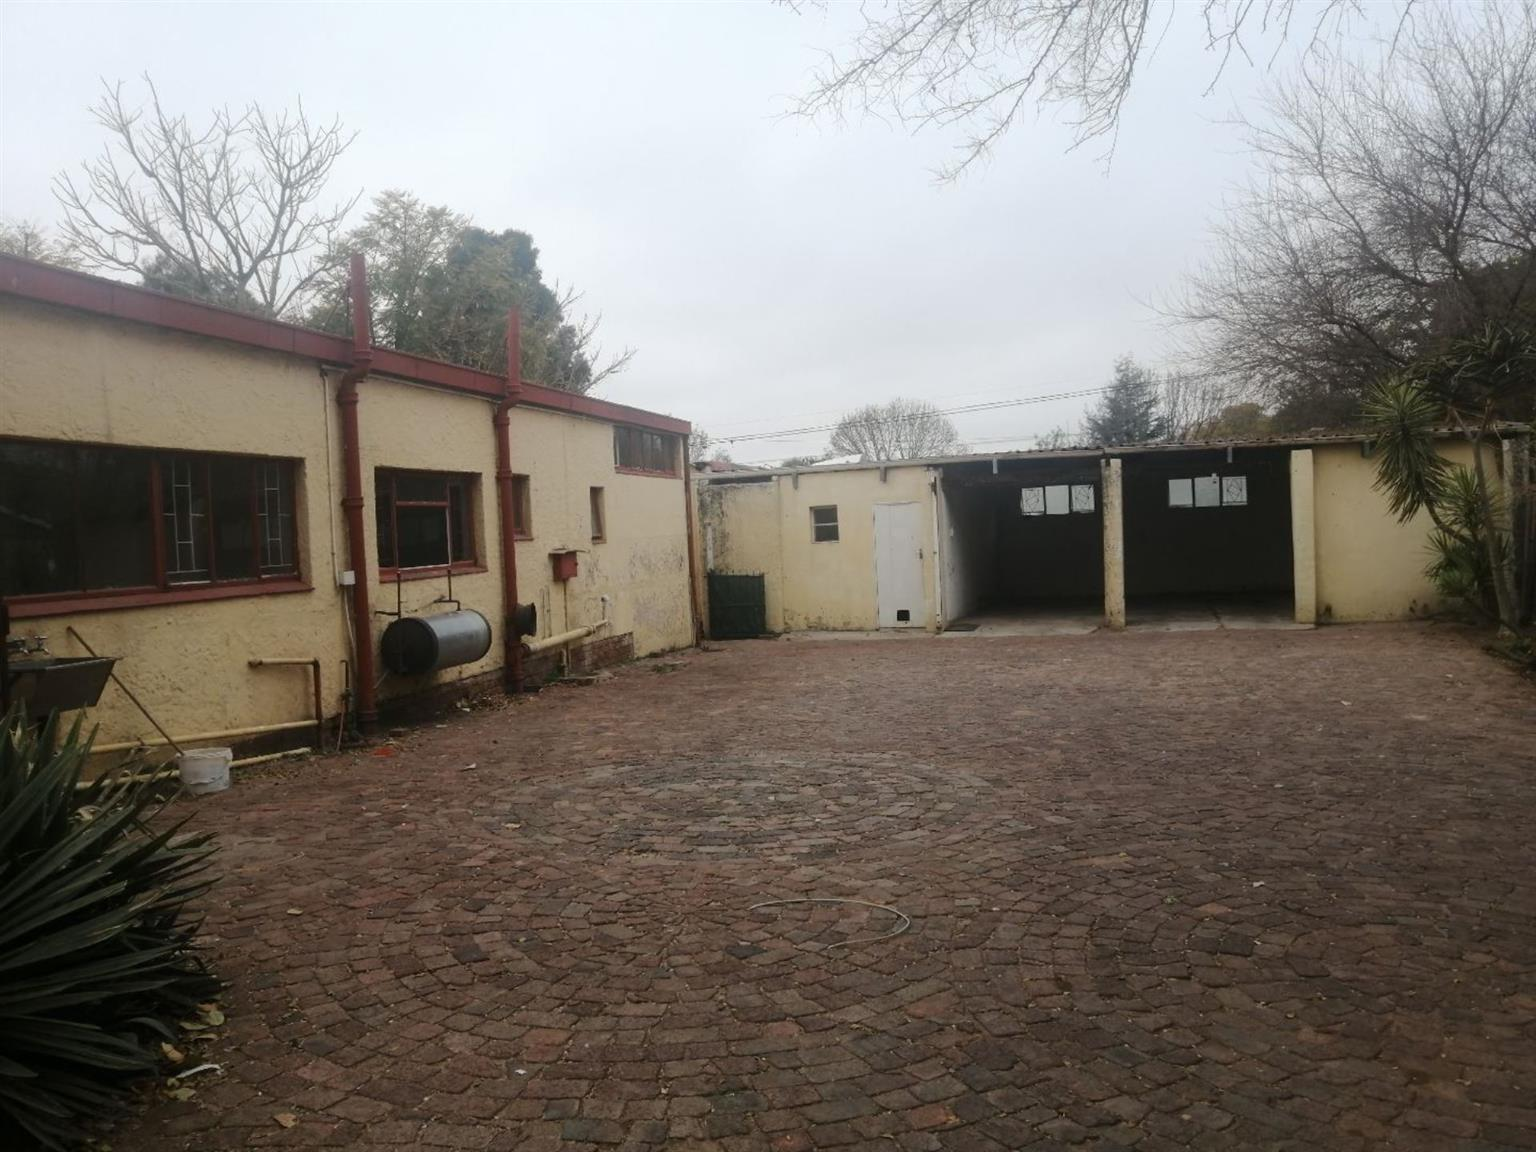 House Rental Monthly in KILNER PARK